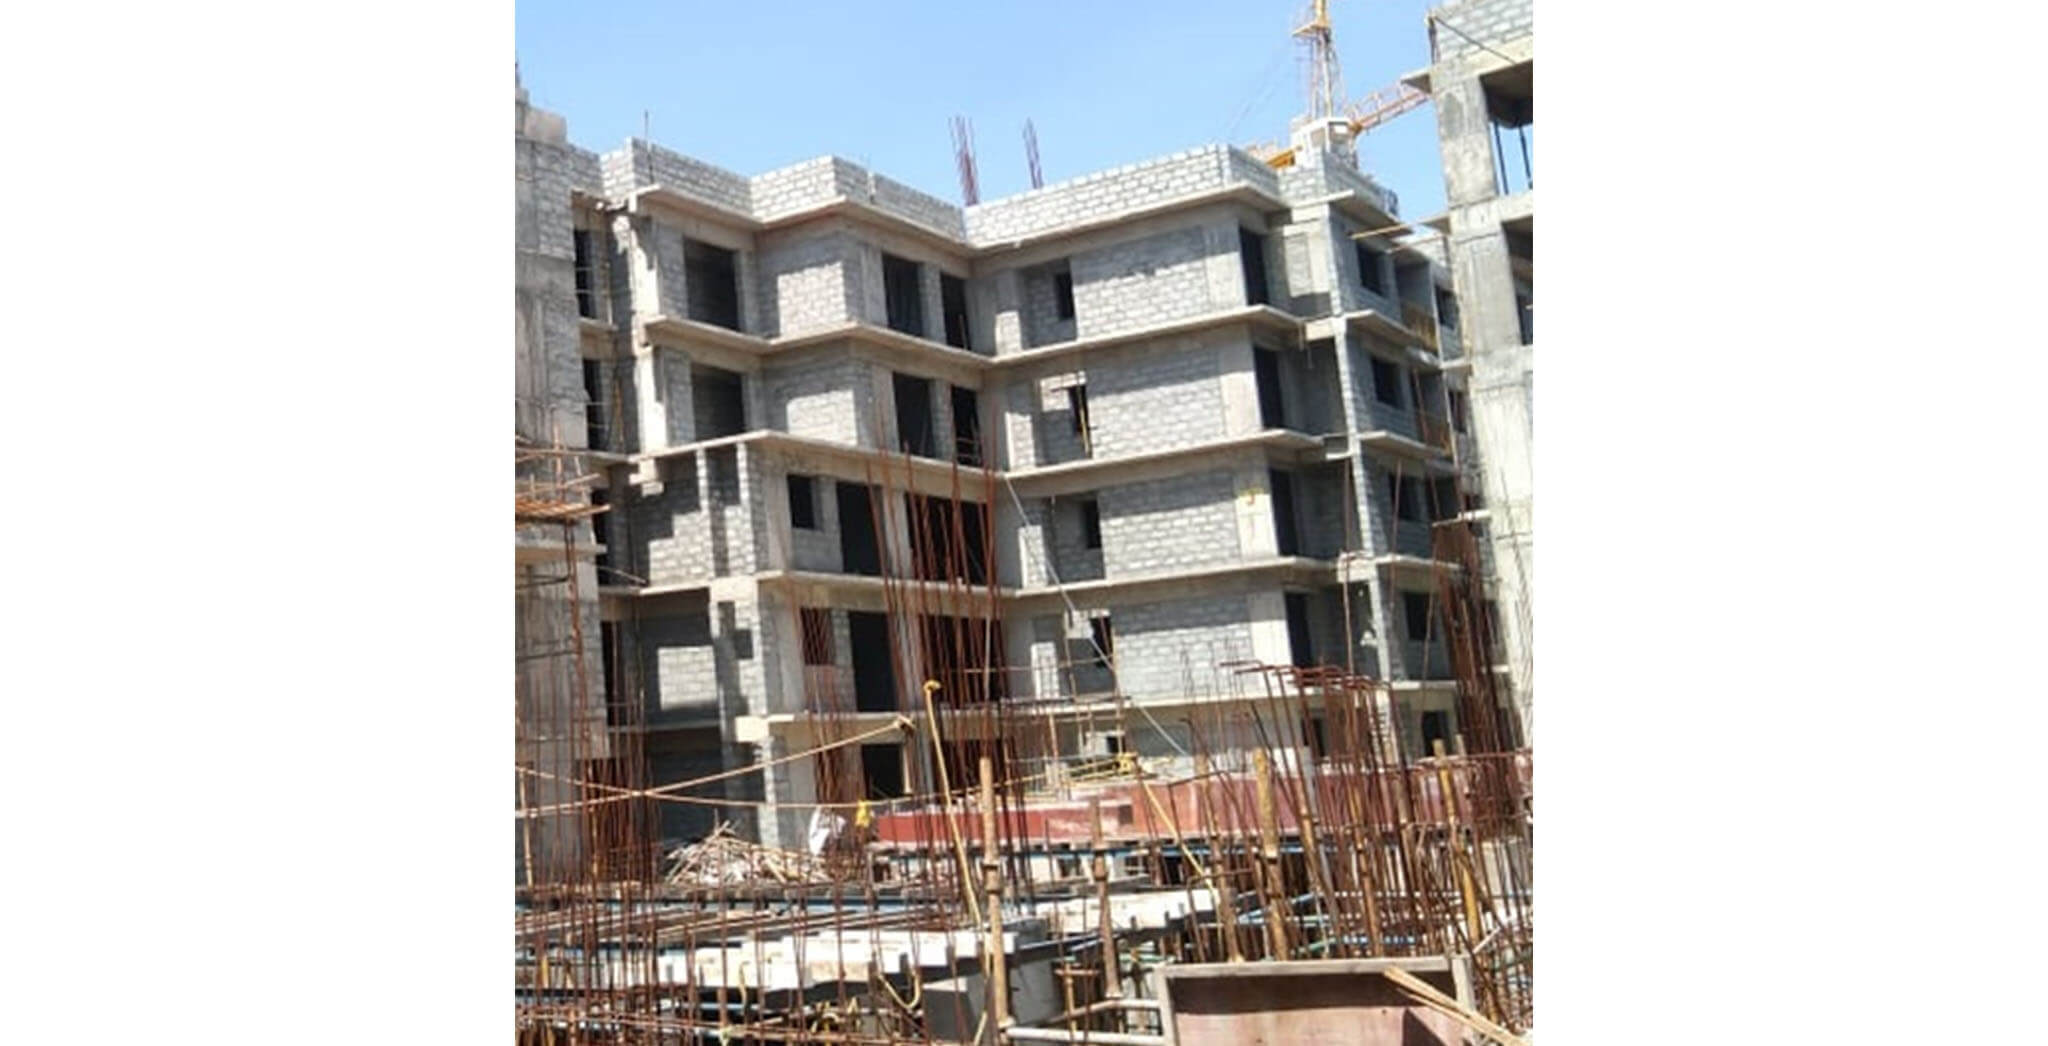 Aug 2020 - J Block: 3rd floor internal plastering work-in-progress; 2nd floor toilet waterproofing completed.